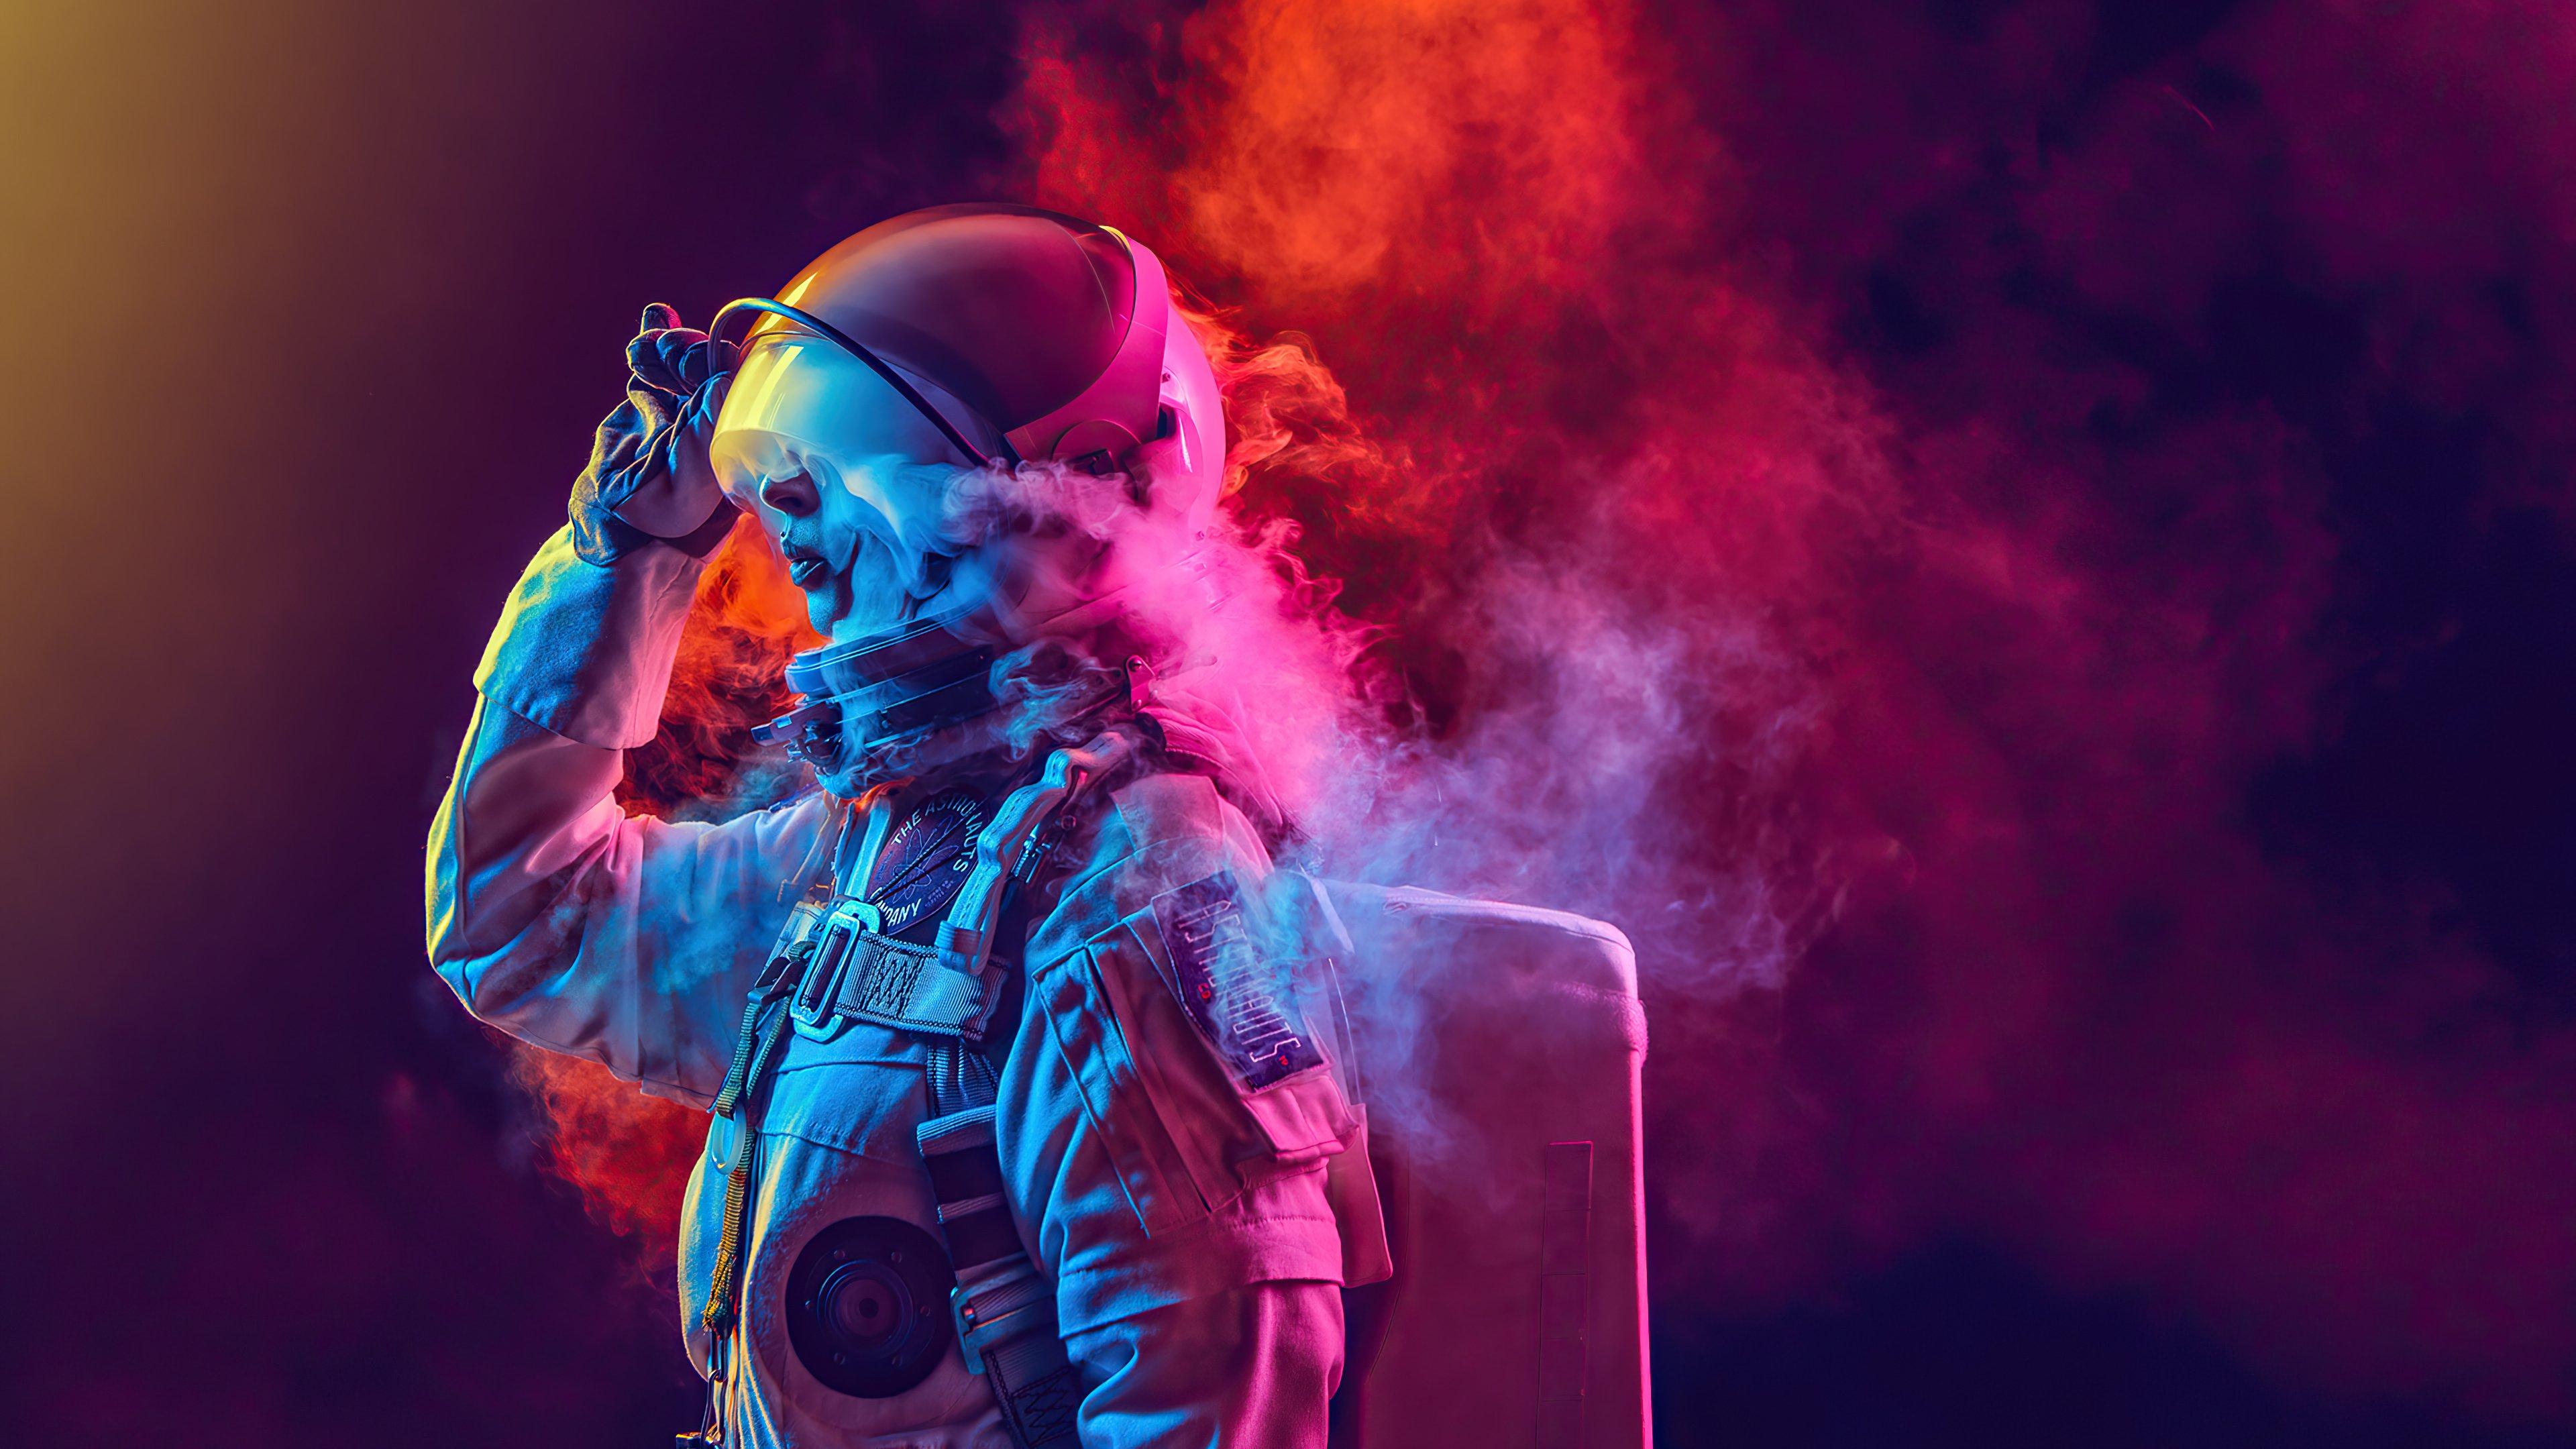 Fondos de pantalla Astronauta entre humo de colores